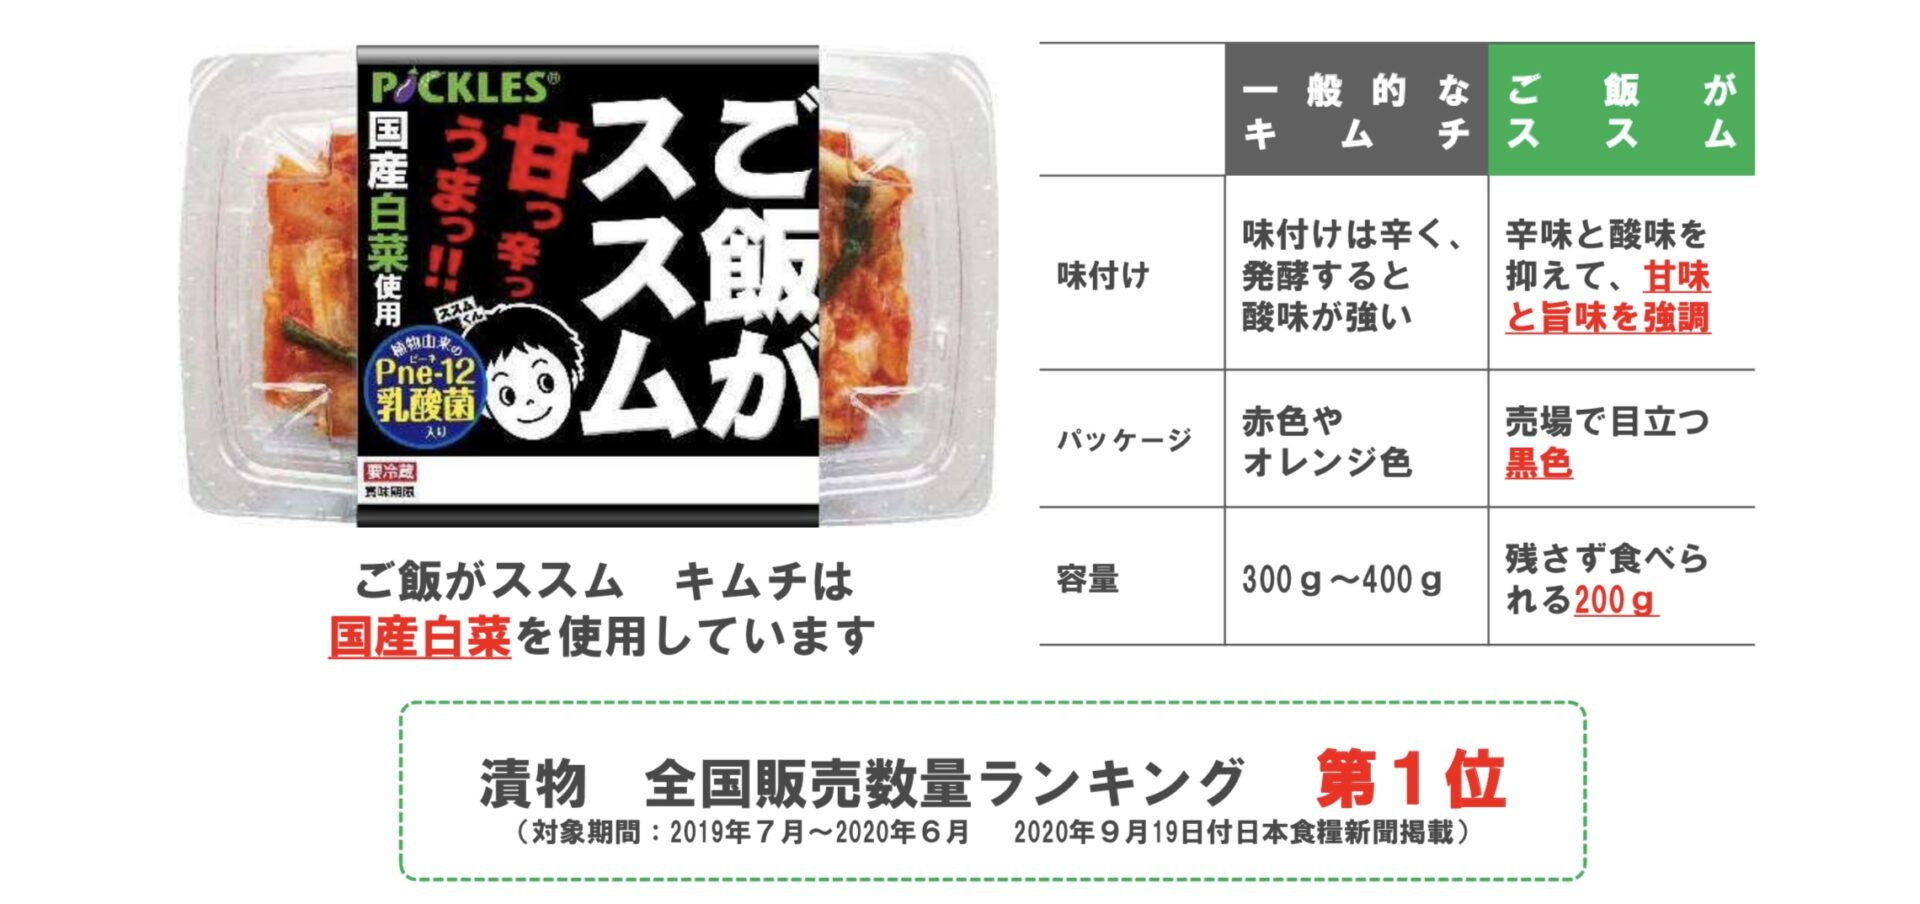 pickles-ご飯がススムキムチ